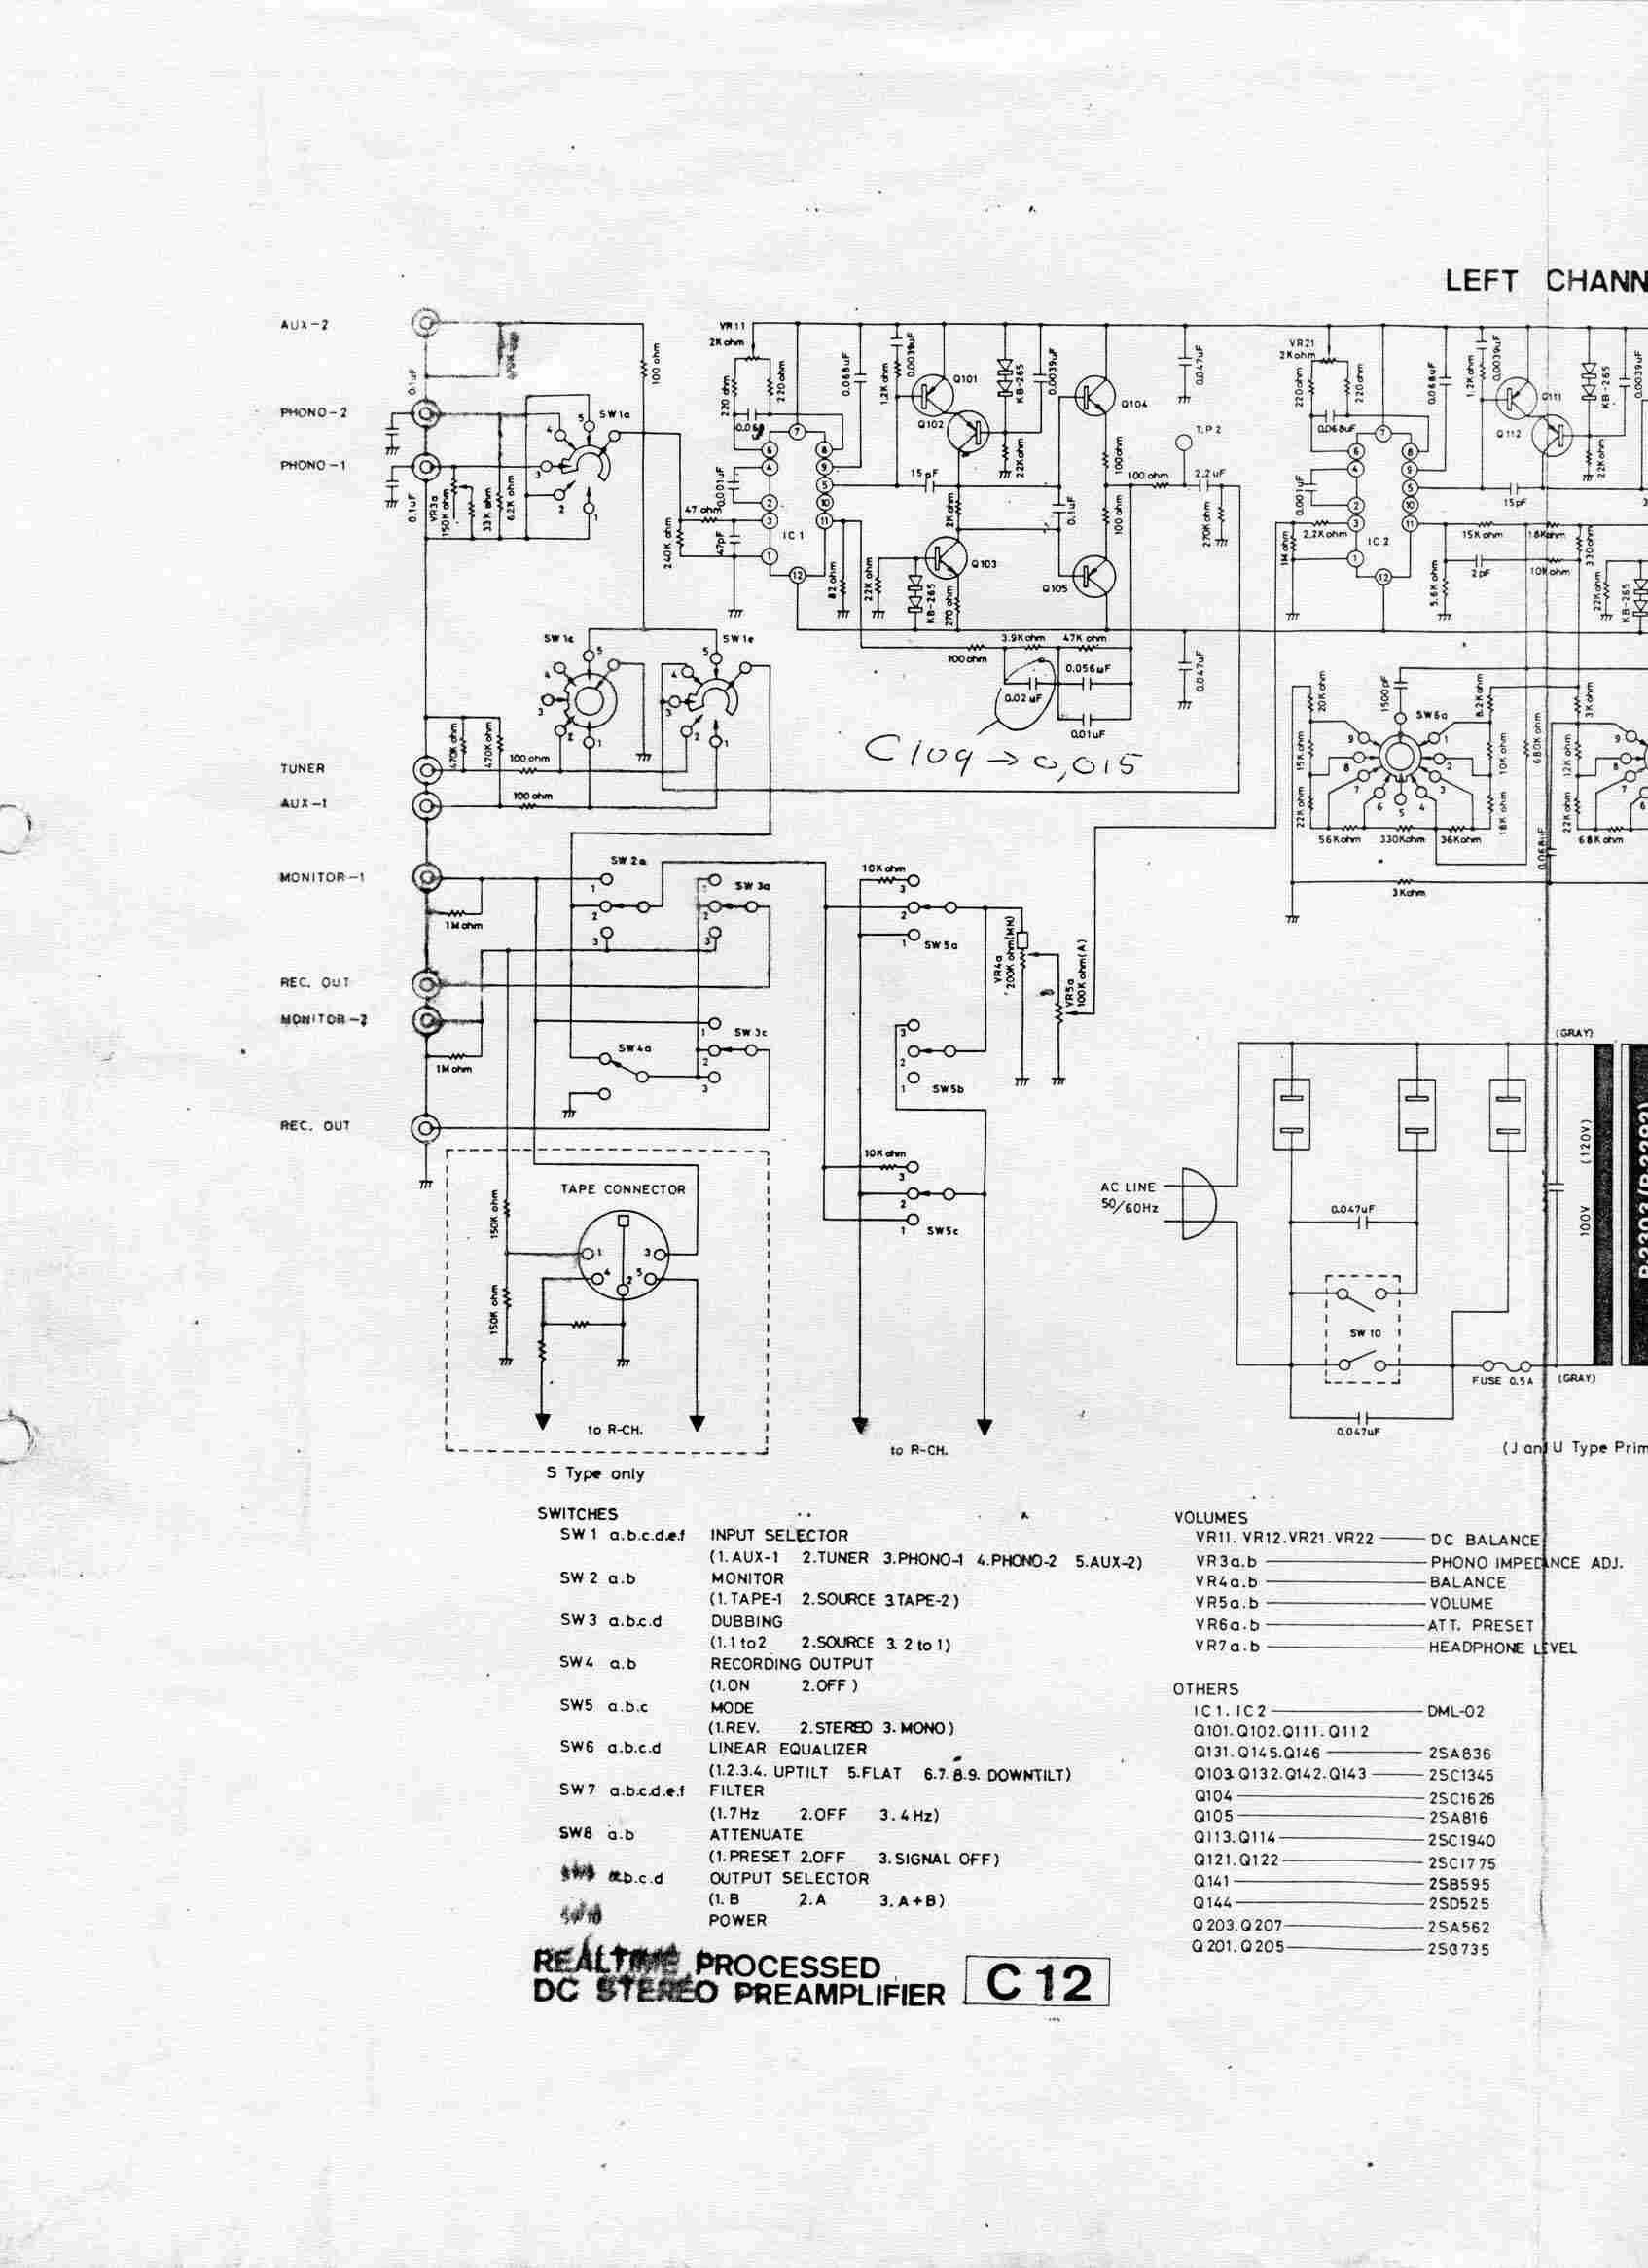 luxman audio products  luxman audio products